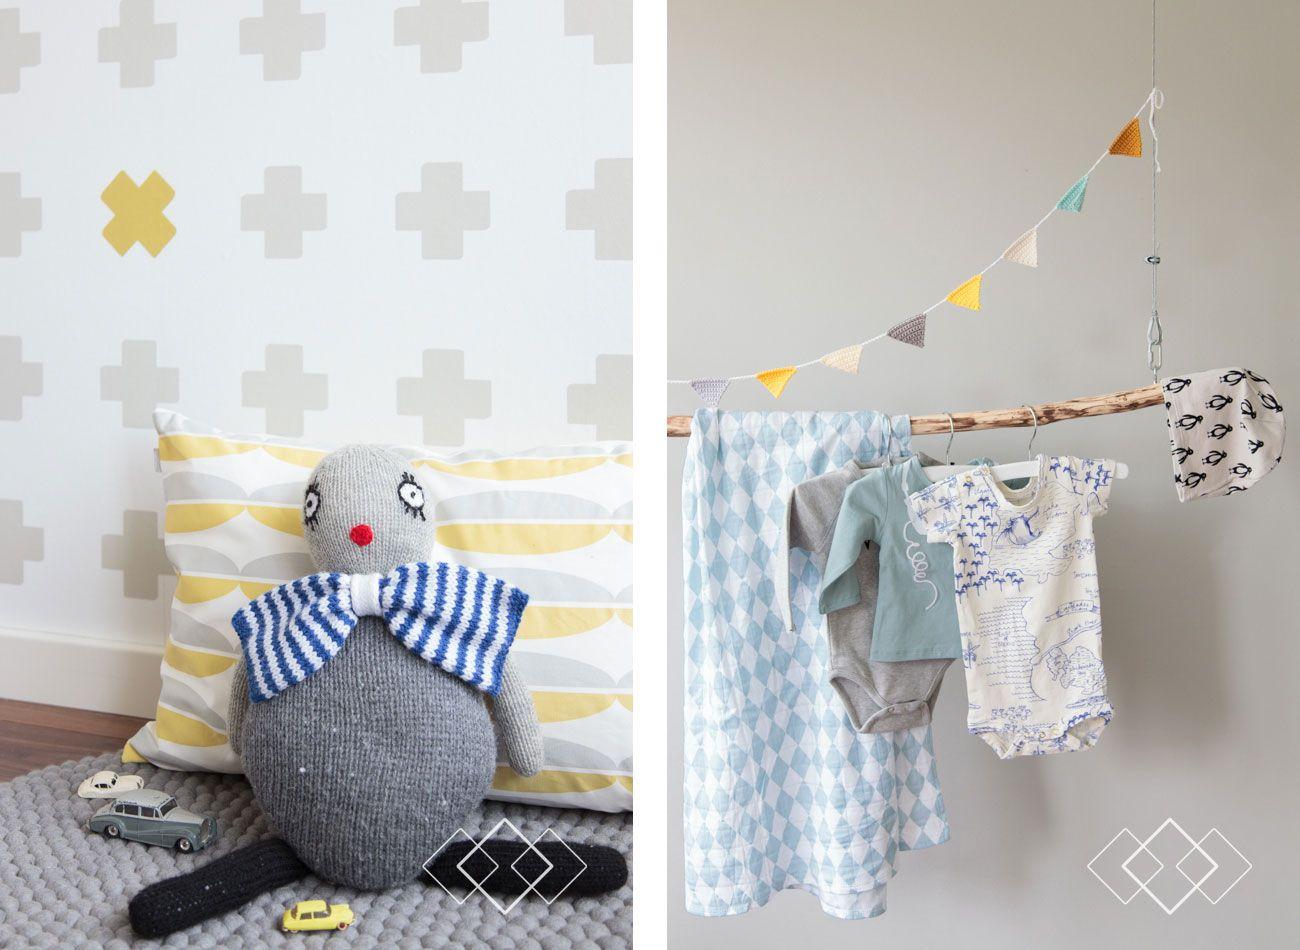 Behang Kinderkamer Zebra : Babykamer met bibelotte behang prchtg u2022 r o o m #2u2022 pinterest